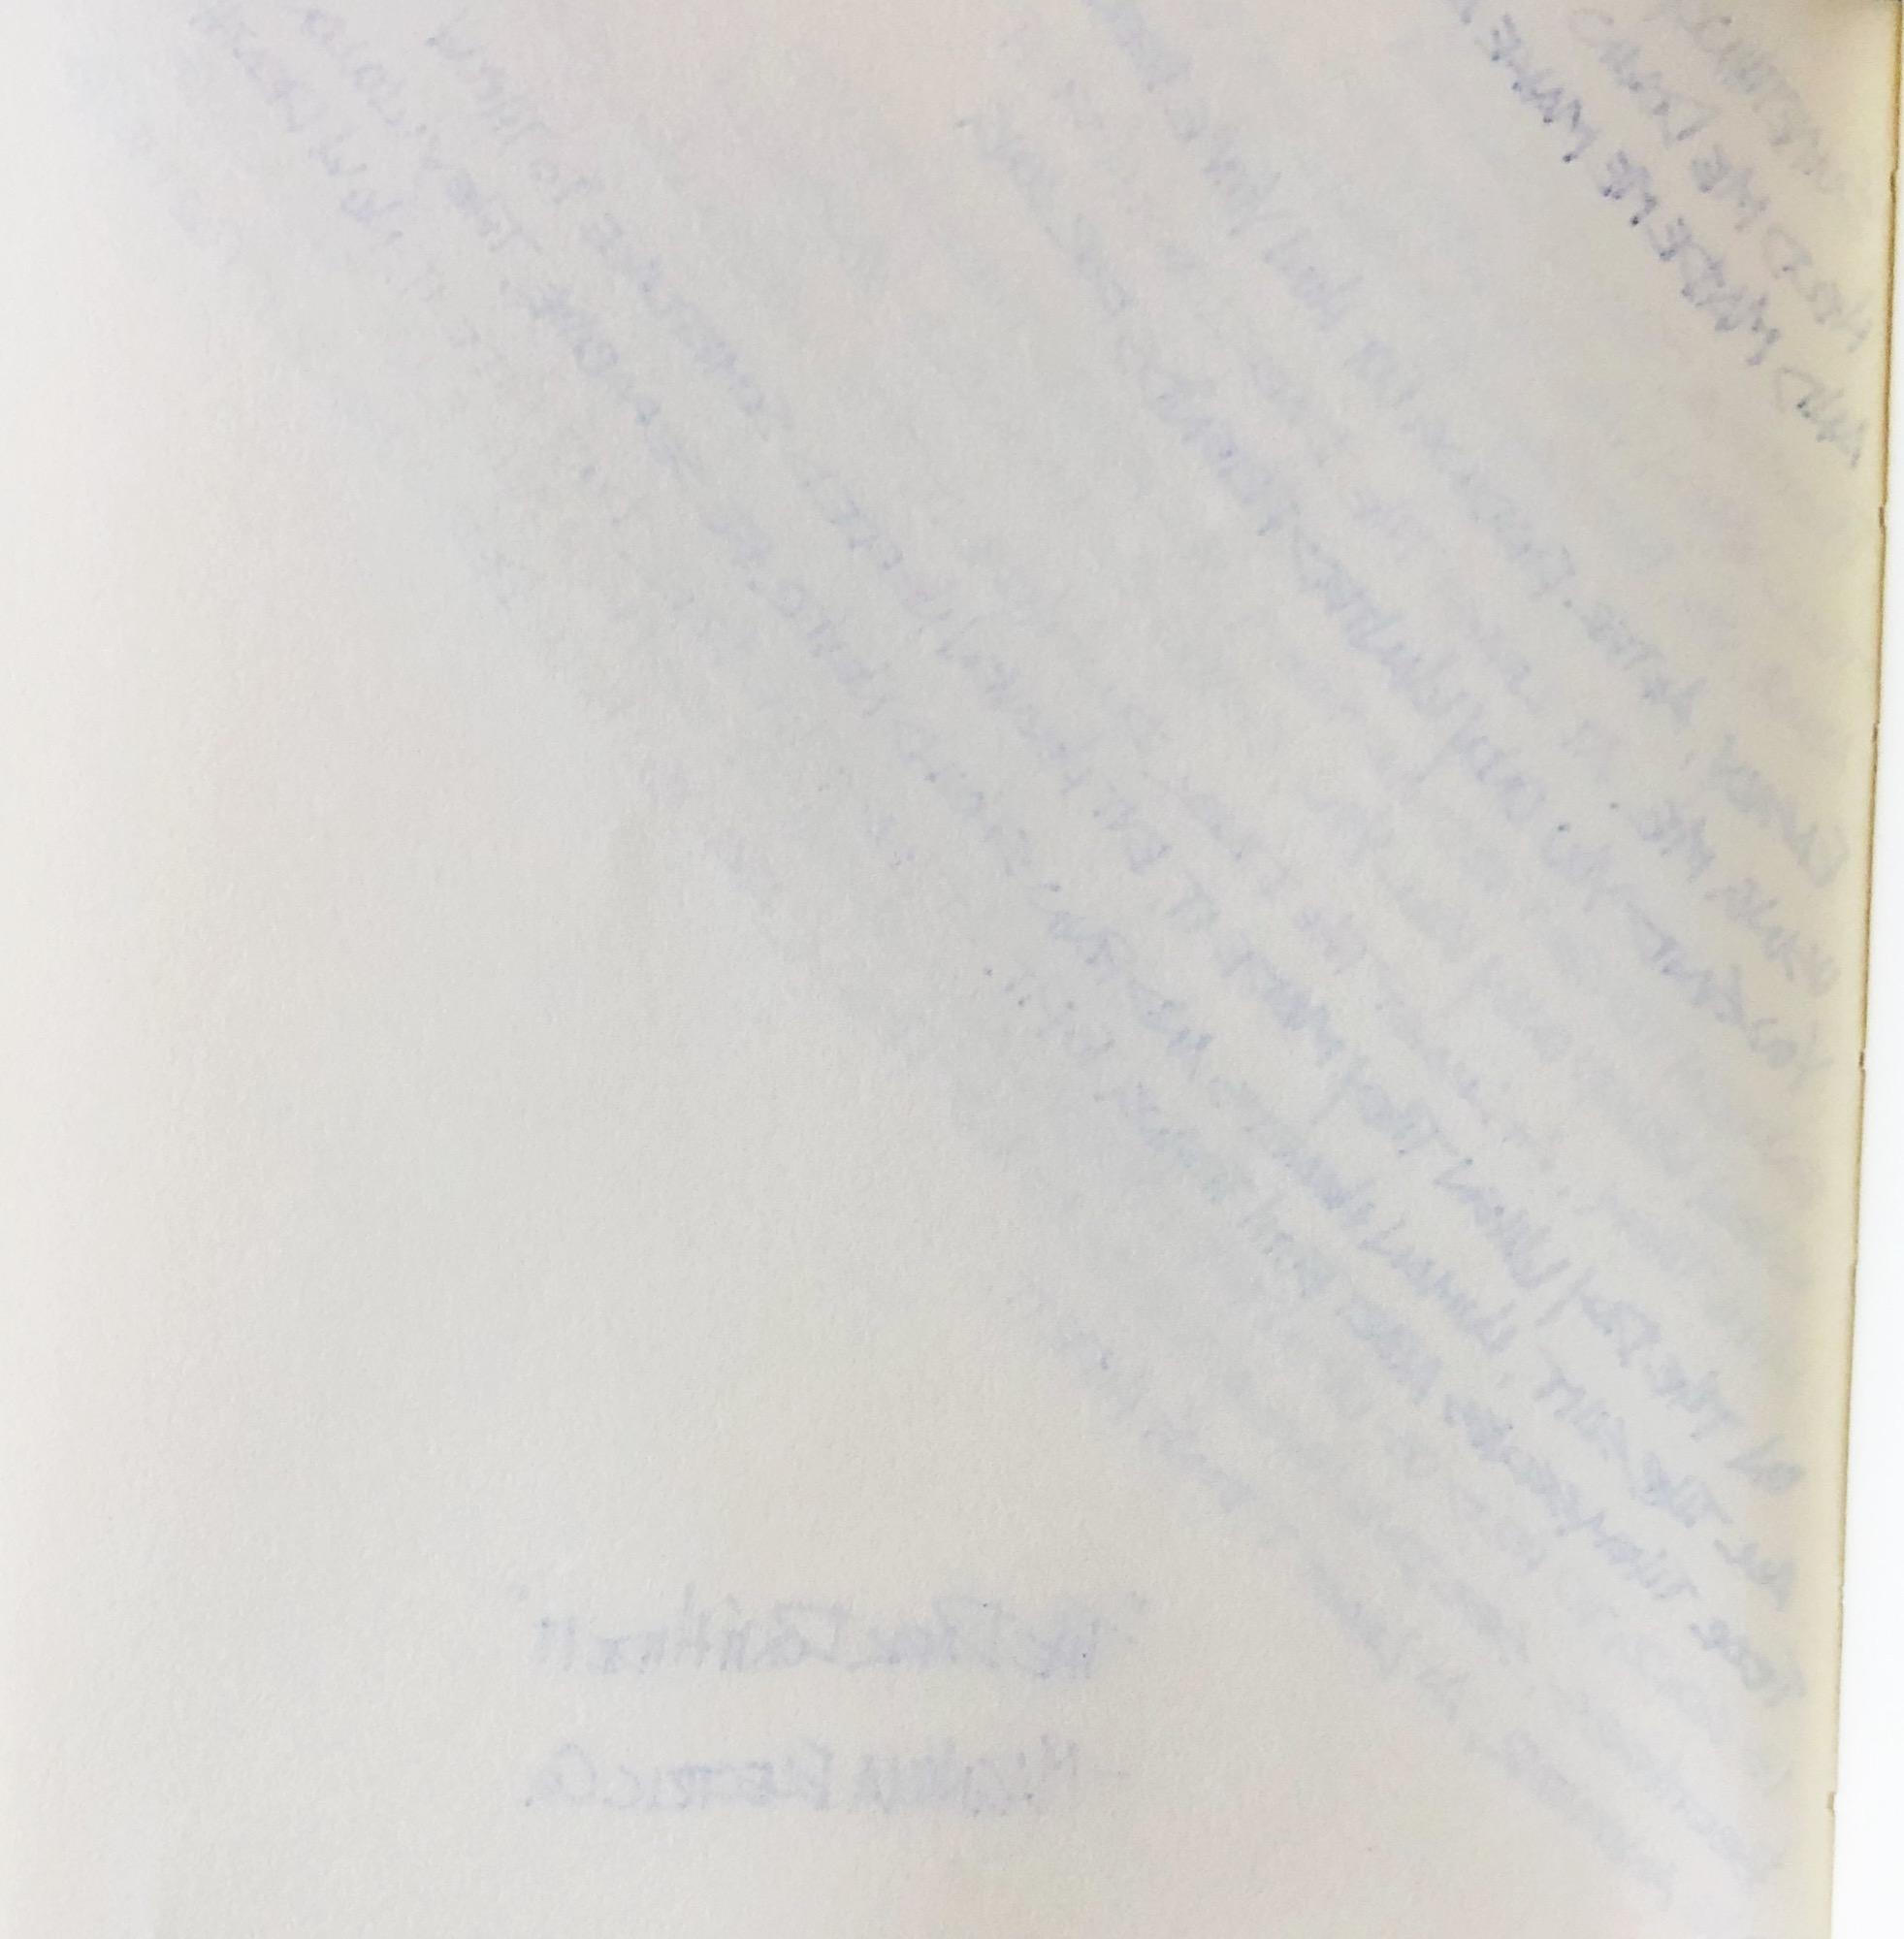 Centralcrafts Capri Journal Pencil